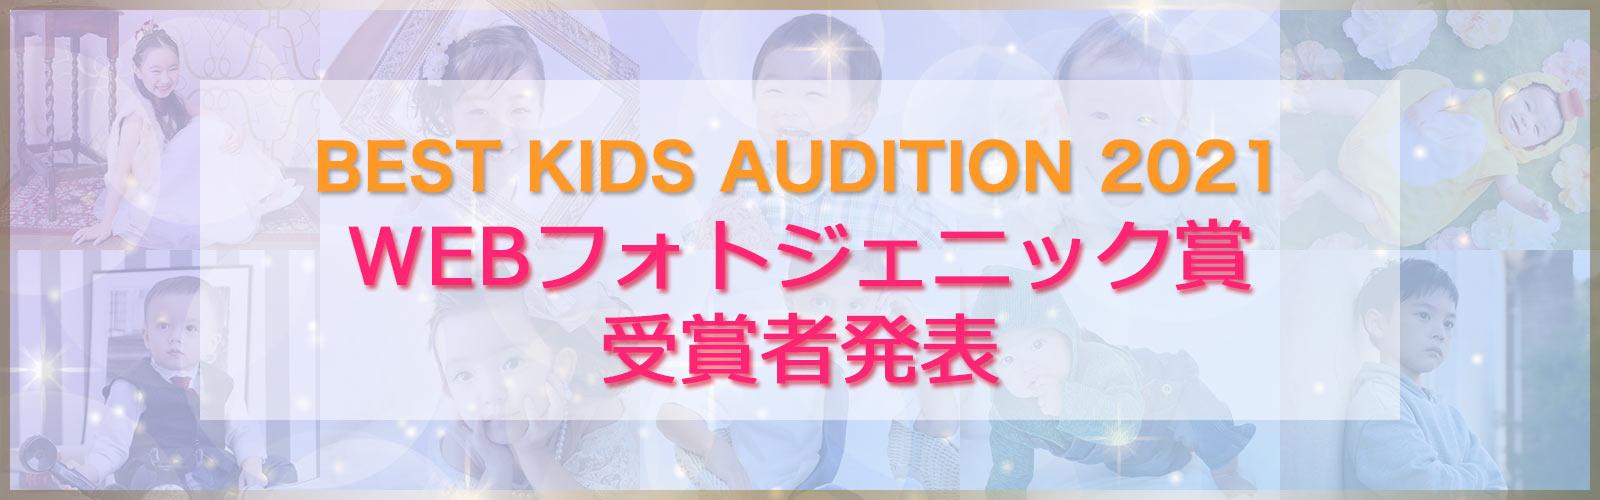 BEST KIDS AUDITION 2021 WEBフォトジェニック賞受賞者発表